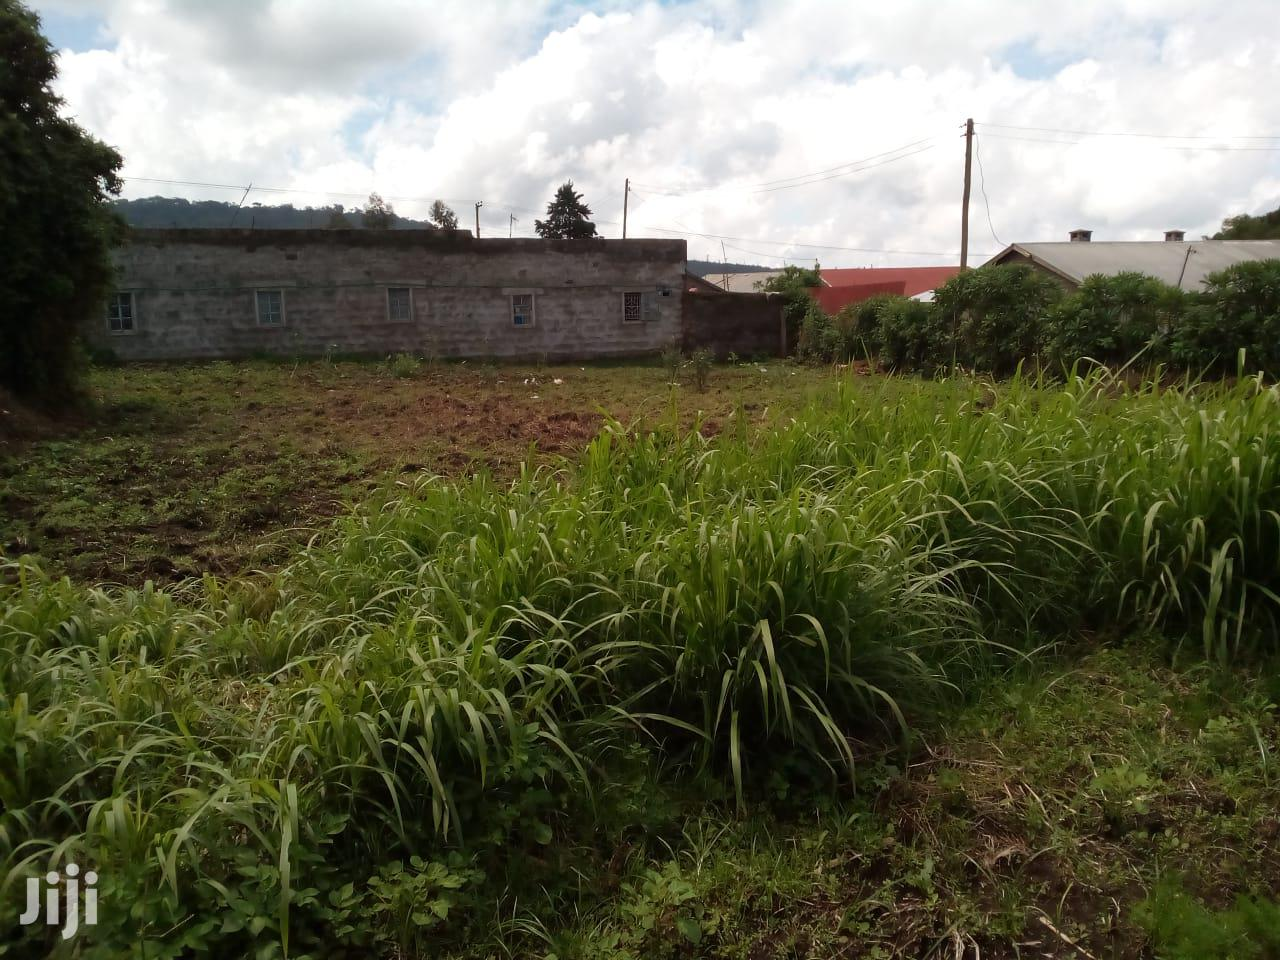 1/4 Plot for Sale in Kimende Along the Highway With Title | Land & Plots For Sale for sale in Lari/Kirenga, Kiambu, Kenya